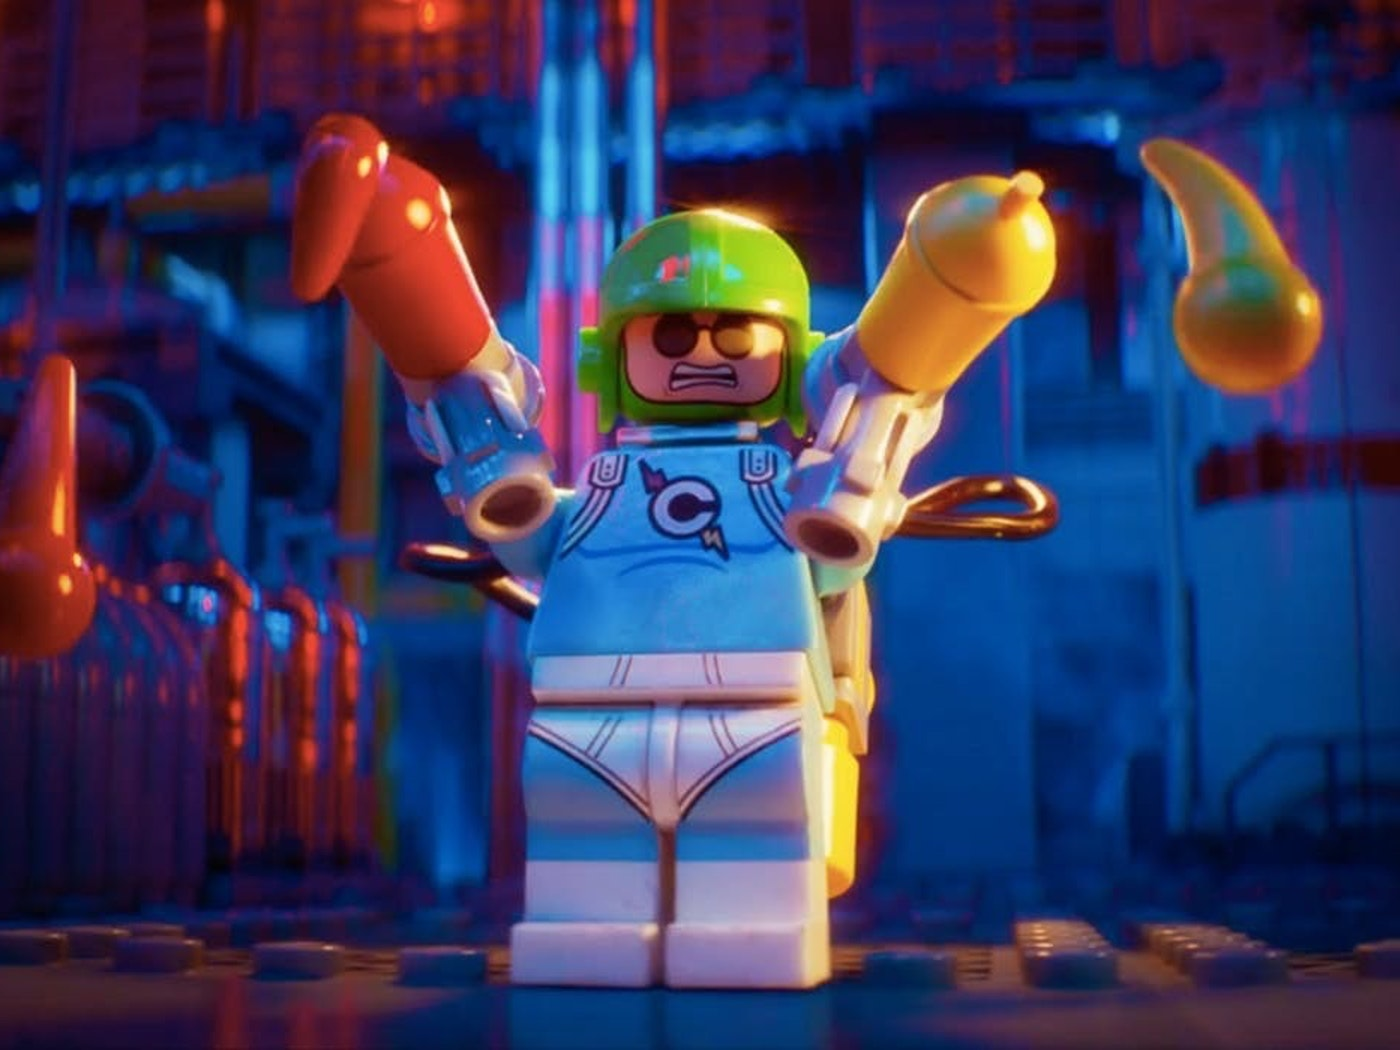 Condiment King in 'The Lego Batman Movie'